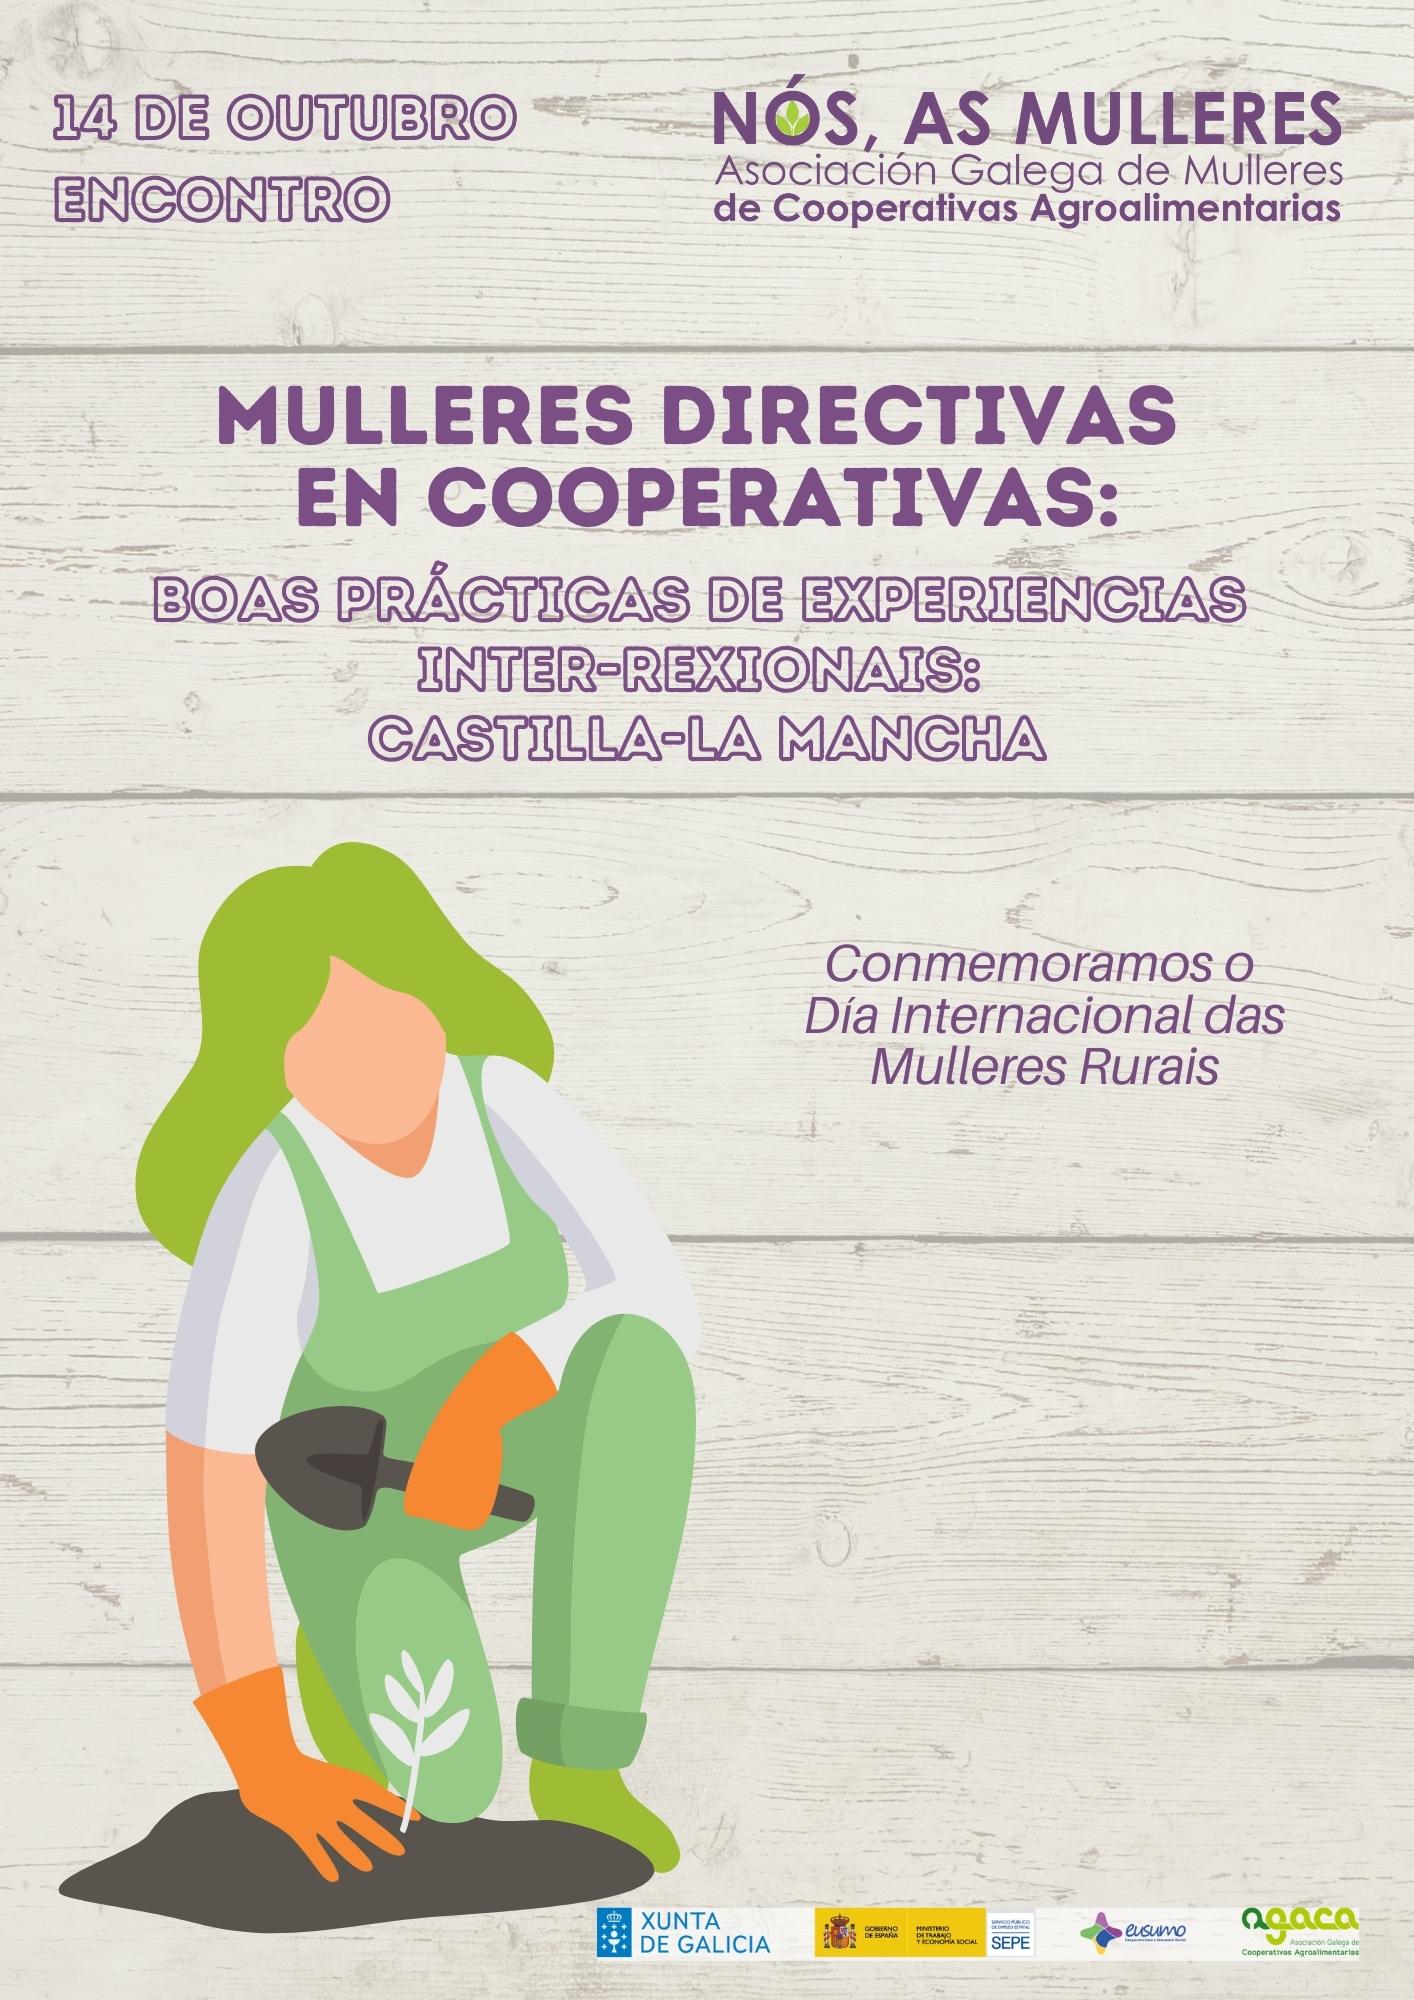 Nós, as Mulleres organiza la Jornada «Mulleres directivas en cooperativas: boas prácticas de experiencias inter-rexionais: Castilla-La Mancha»